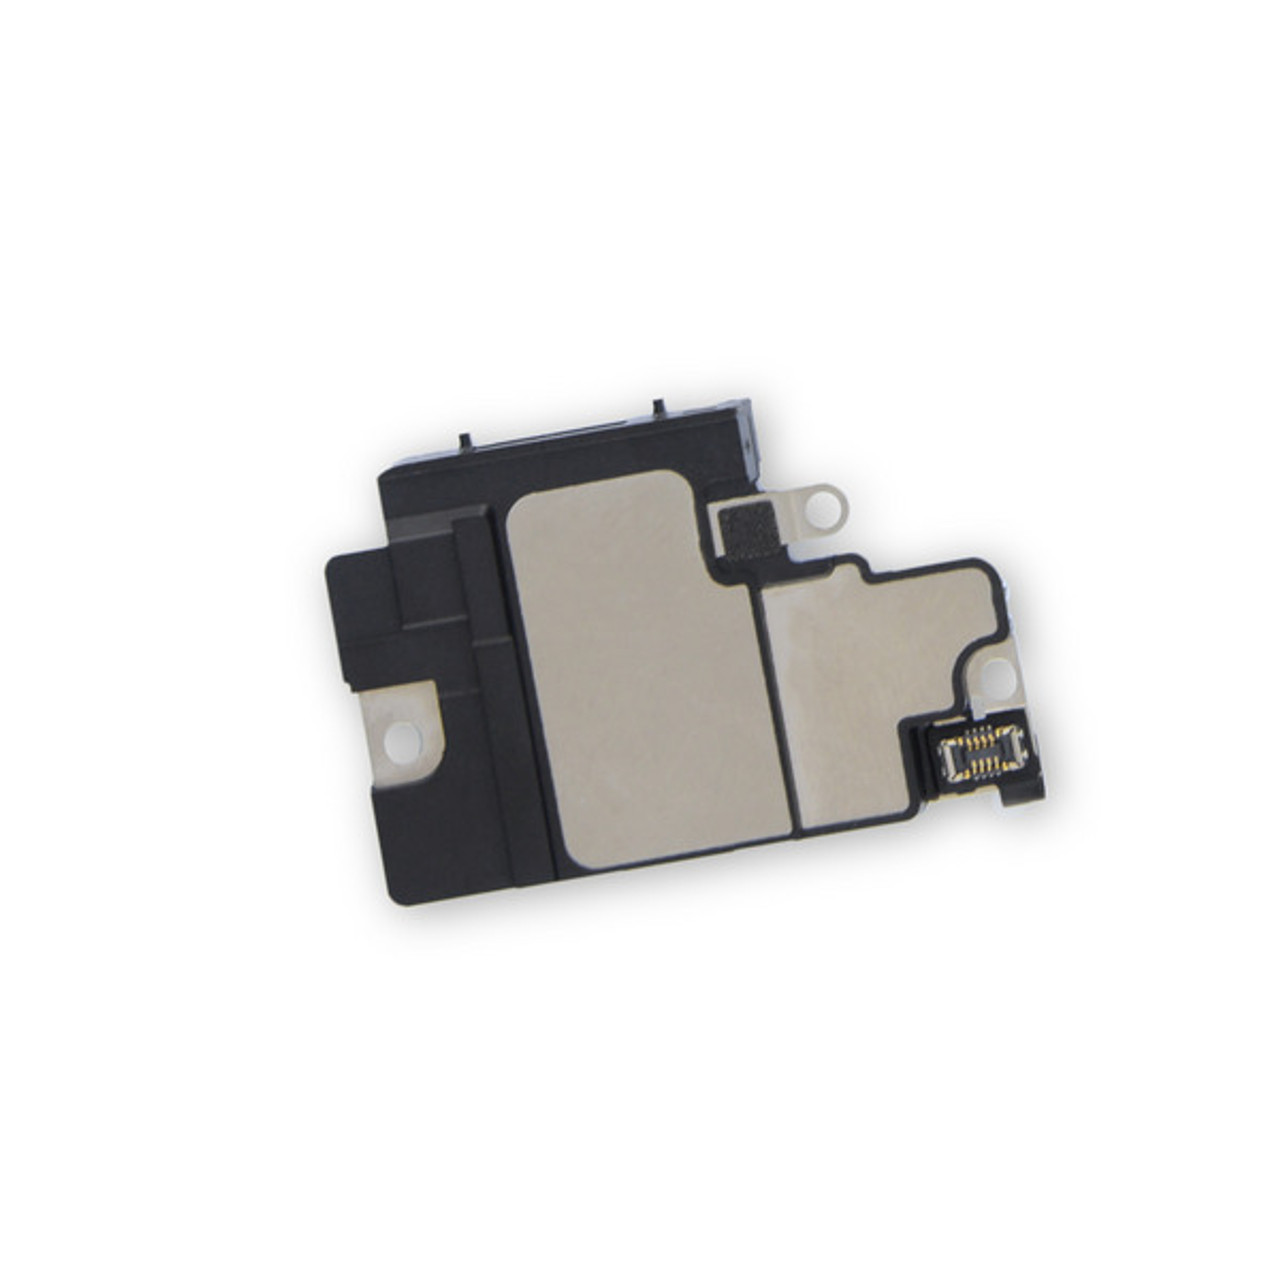 OEM SPEC Ringer Ringtone Loud Speaker Buzzer Sound Replacement For iPhone X 10